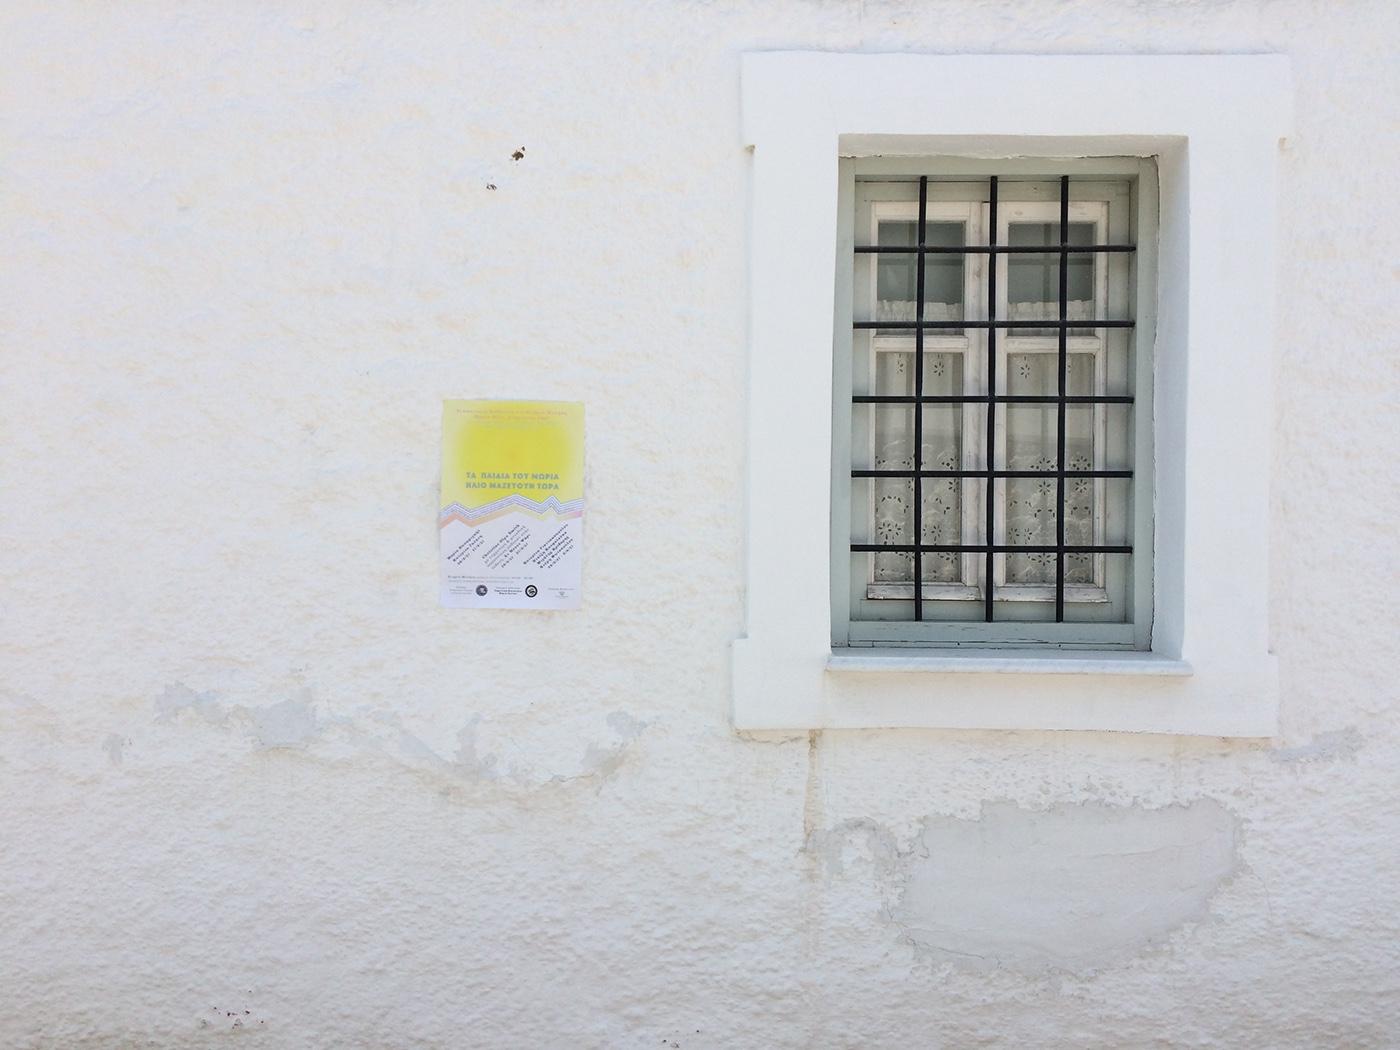 Greece graphic design  Art Exhibition environmental awareness porto heli Milisi Building Summer 2017